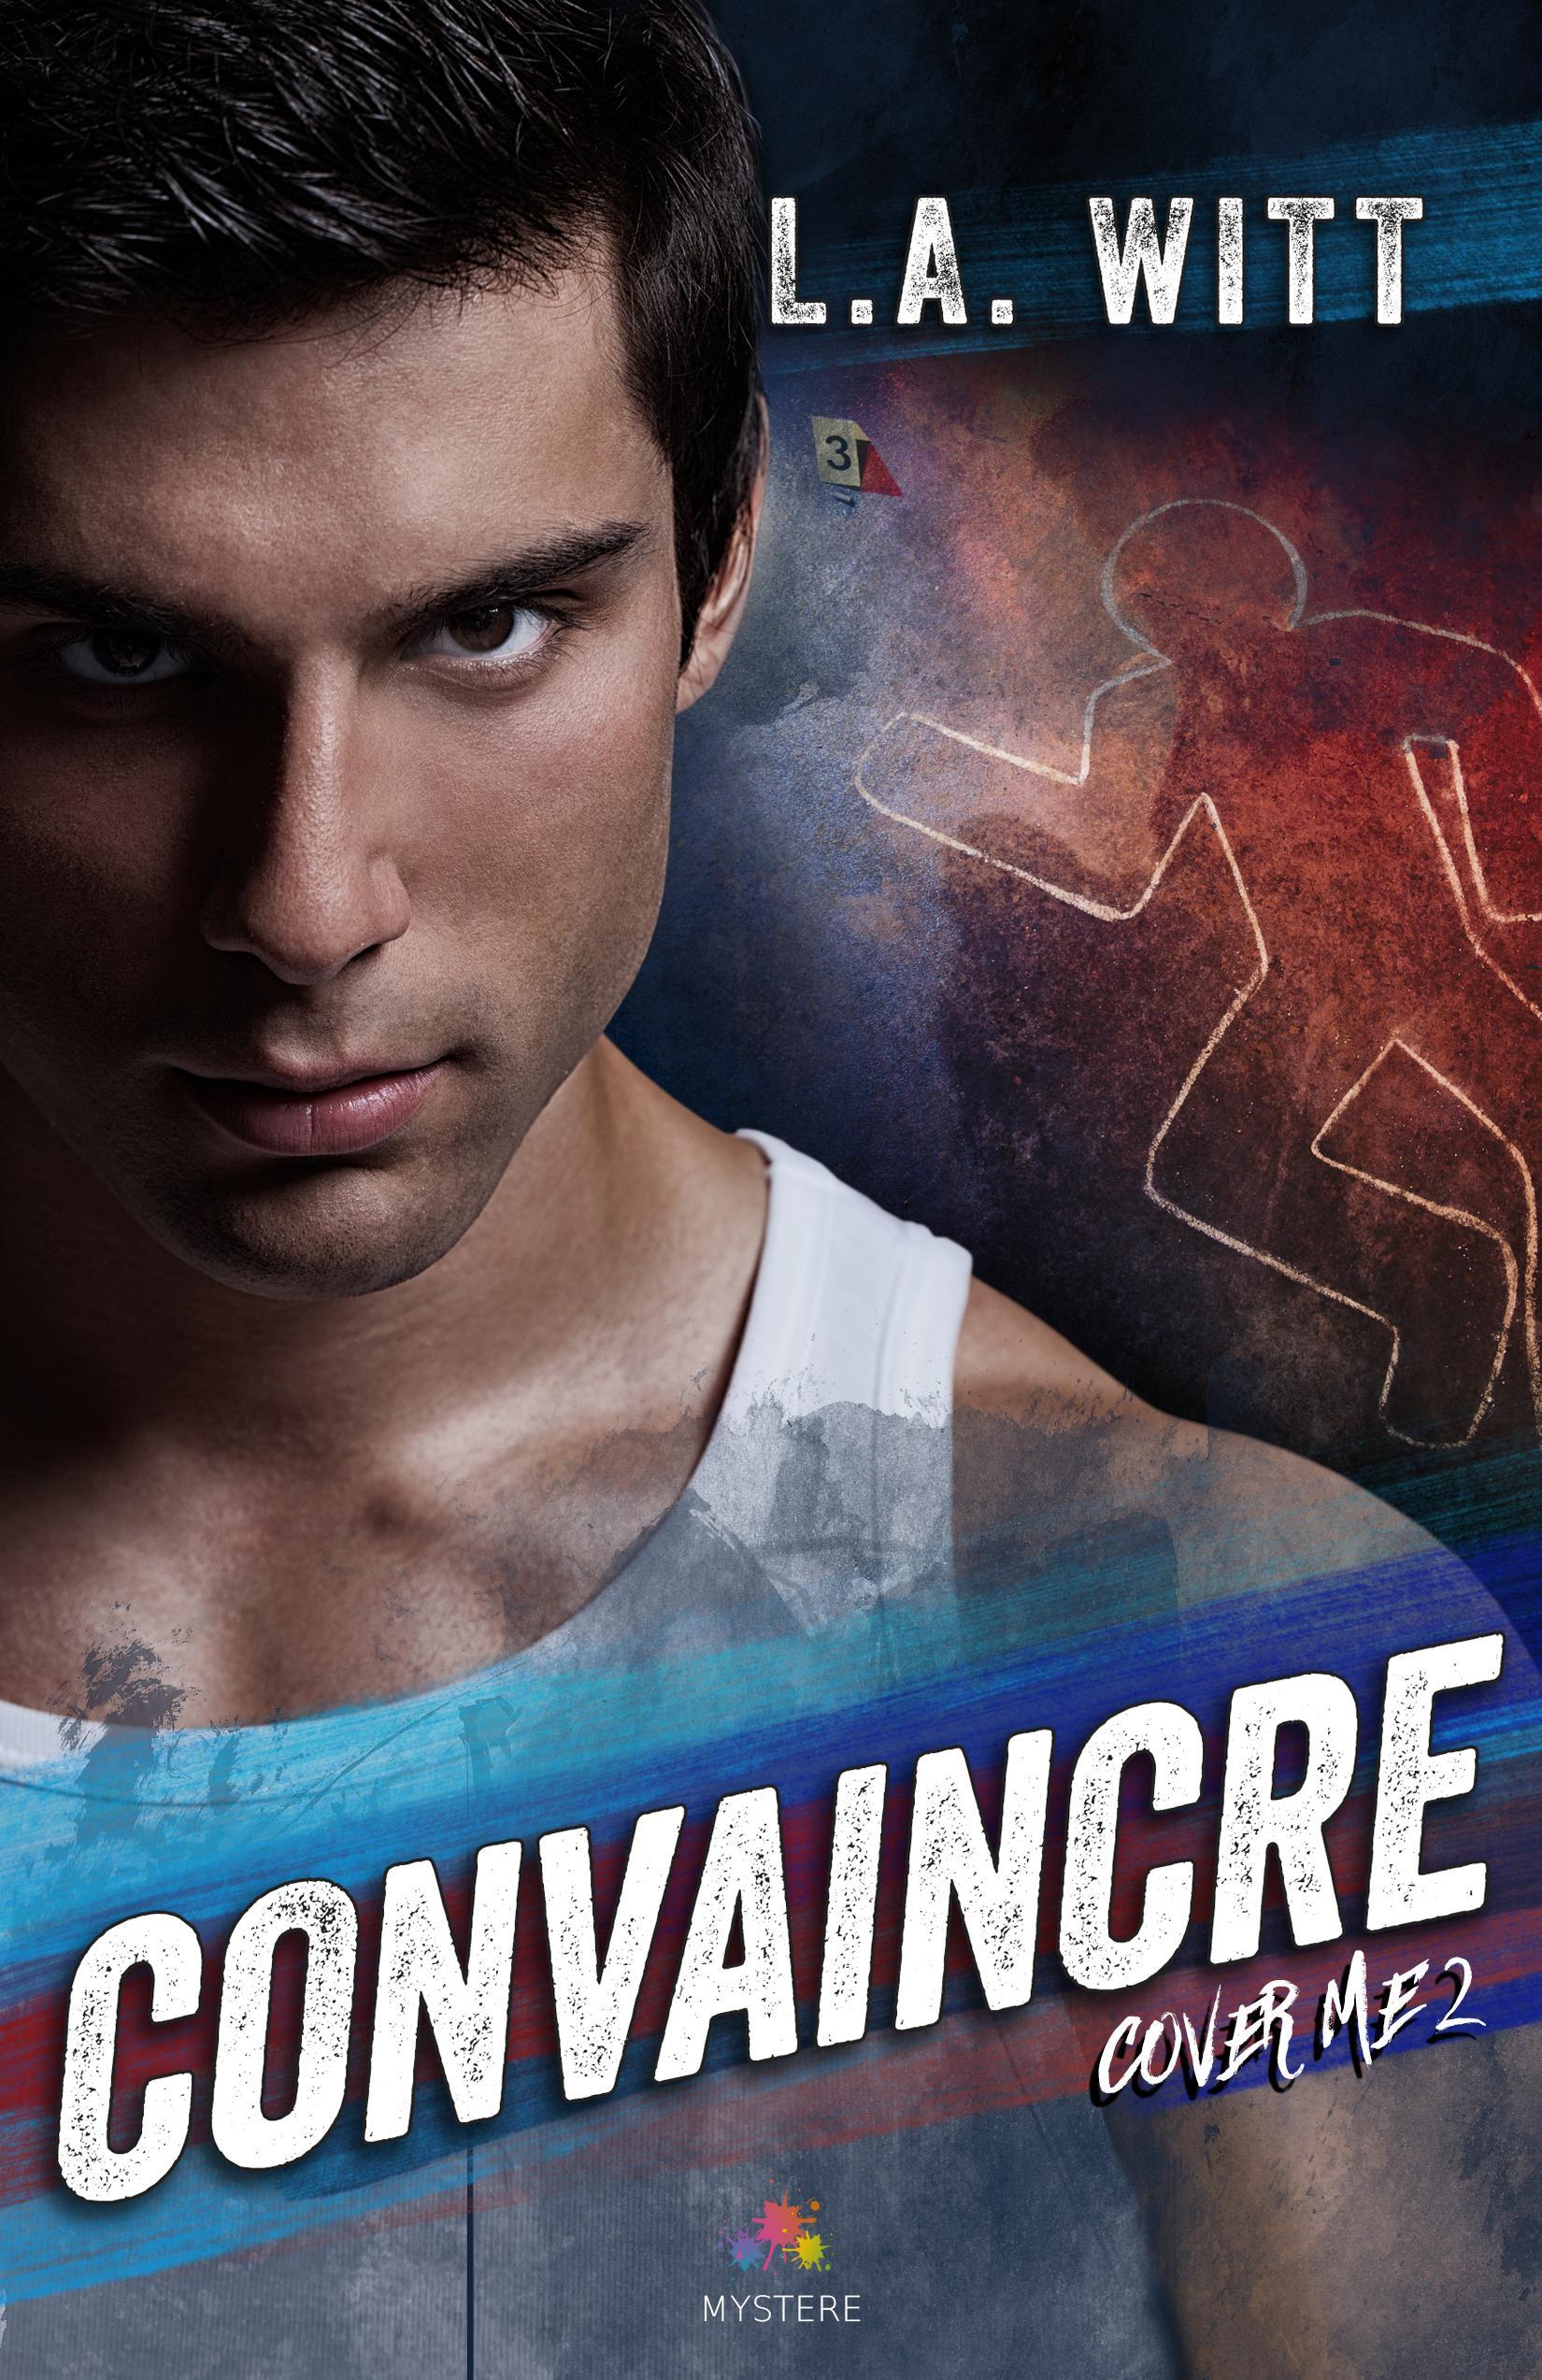 Convaincre, COVER ME, T2